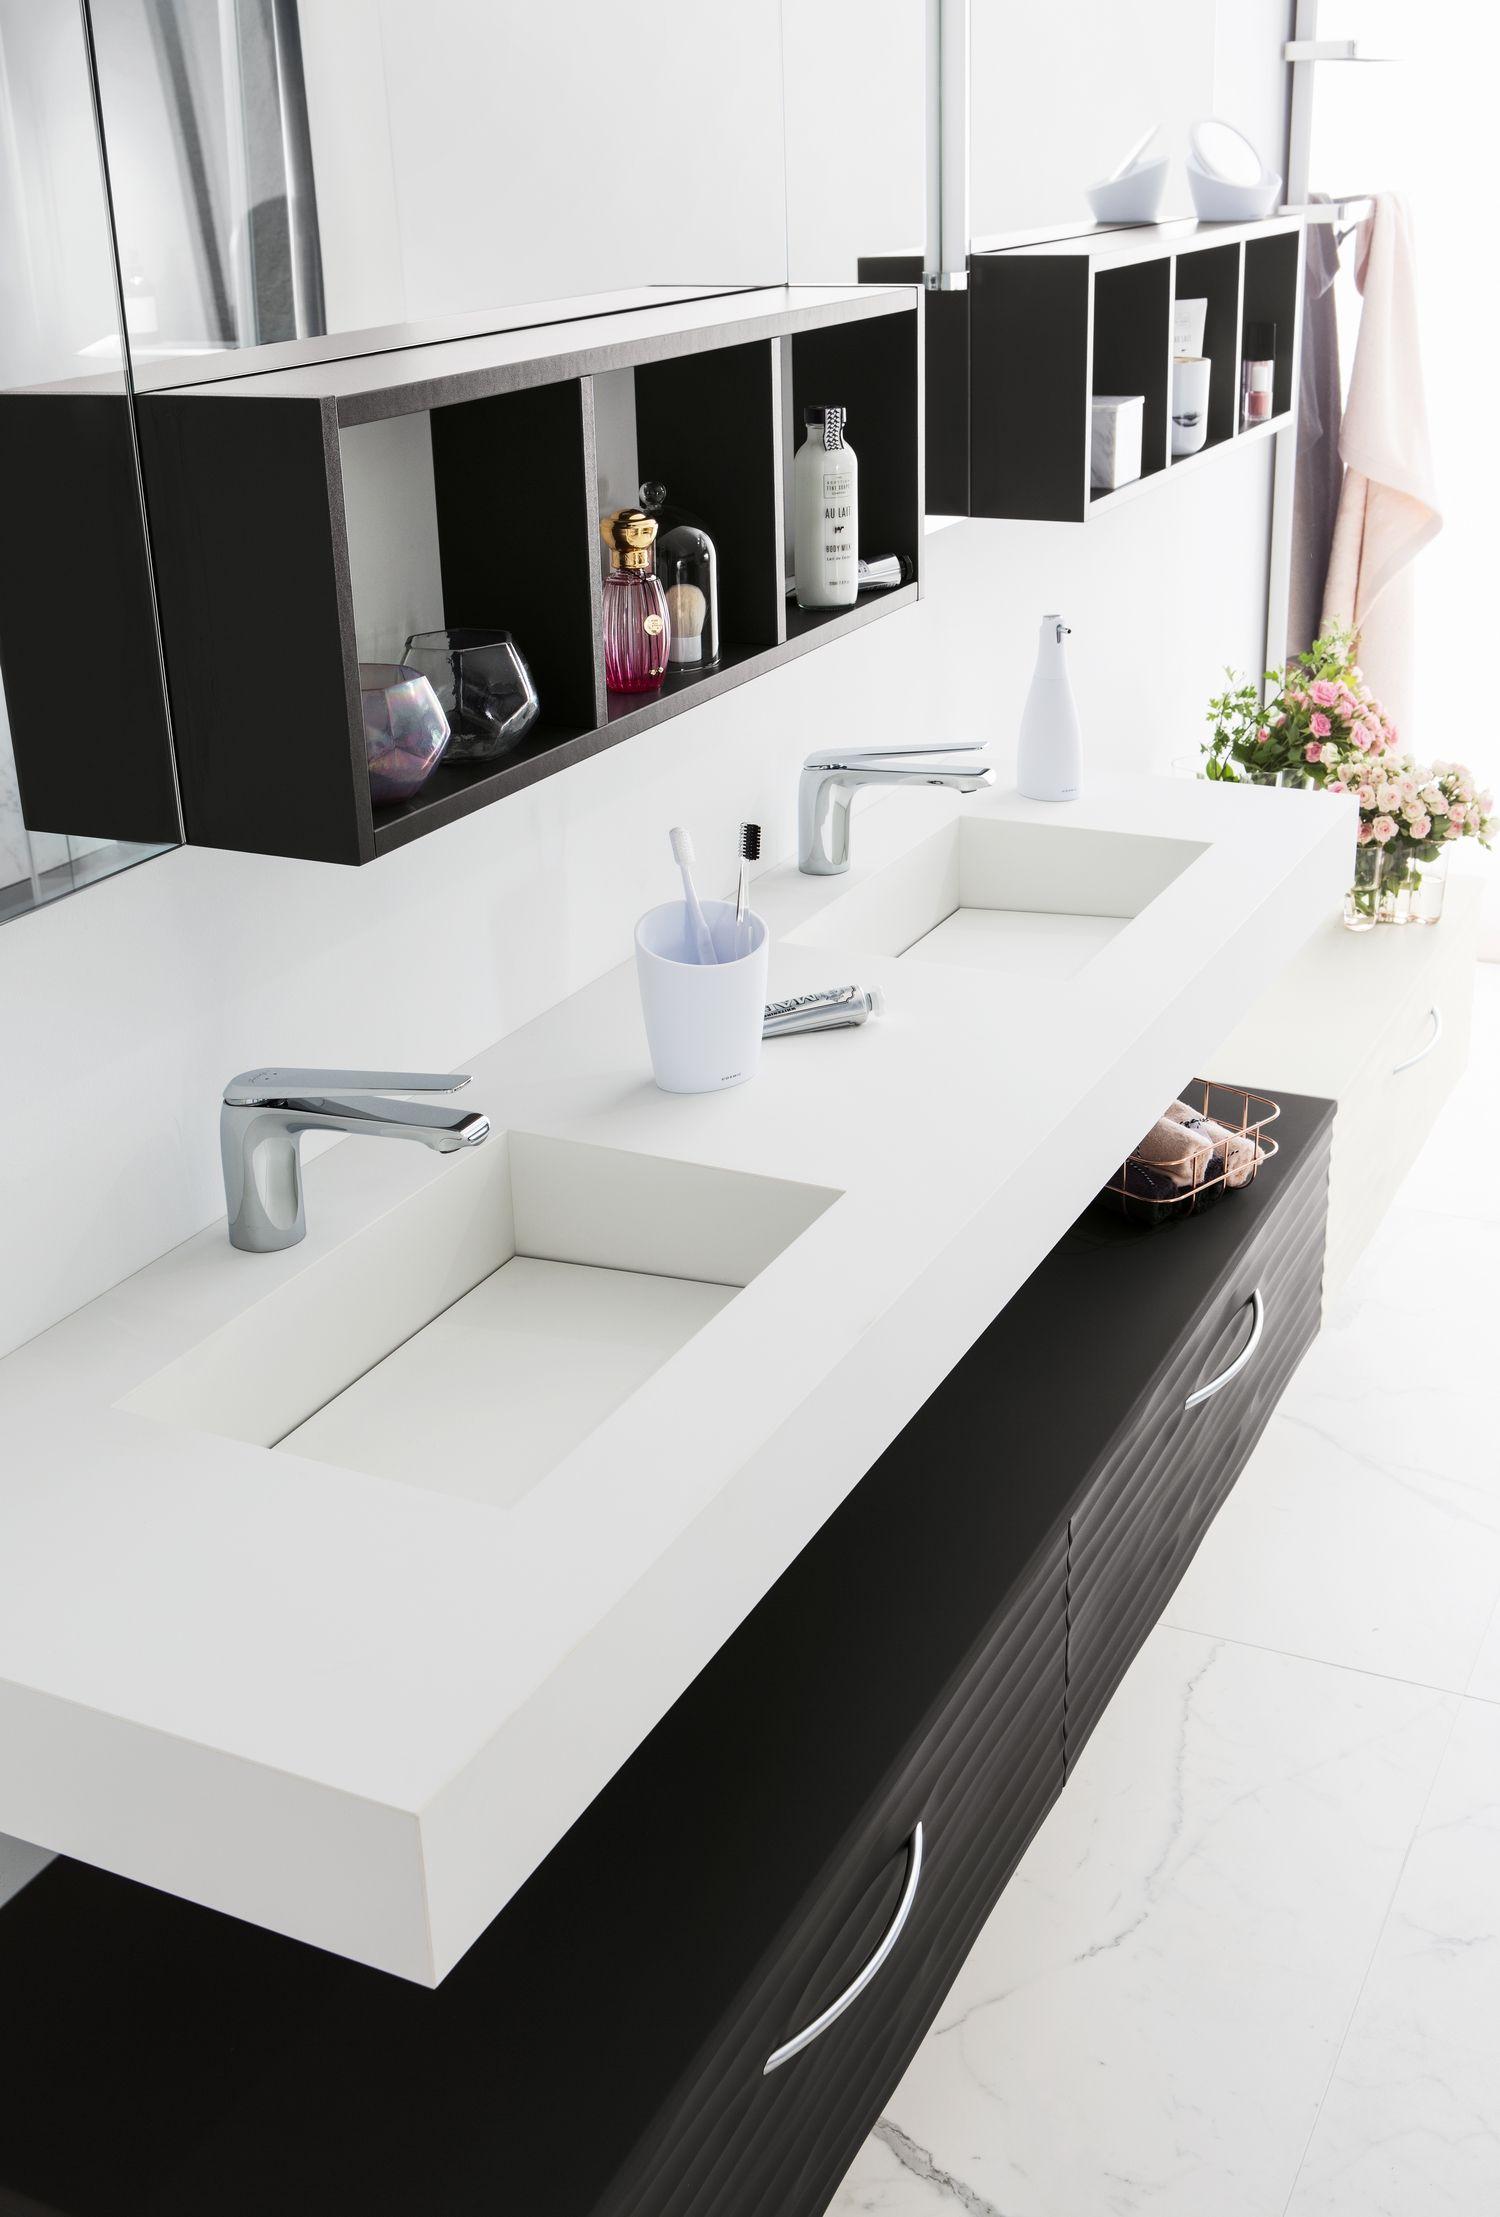 Credence Corian Sur Mesure ambiance design | salle de bain design, salle de bain et